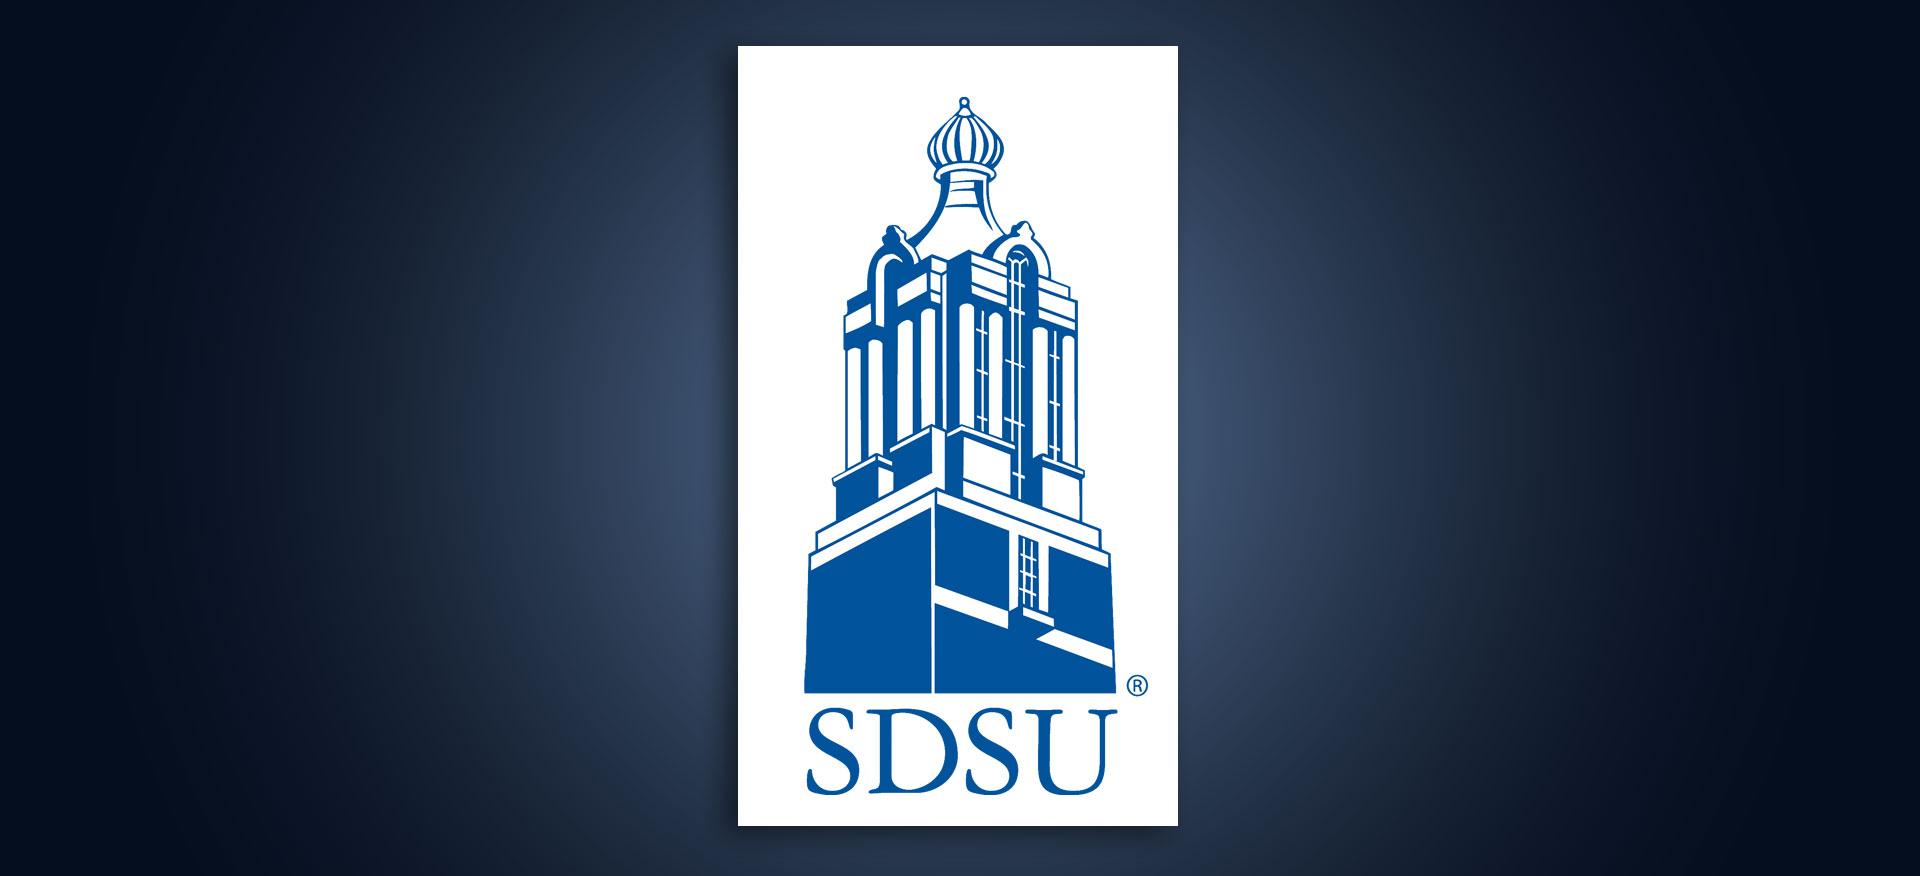 South Dakota State University SDSU